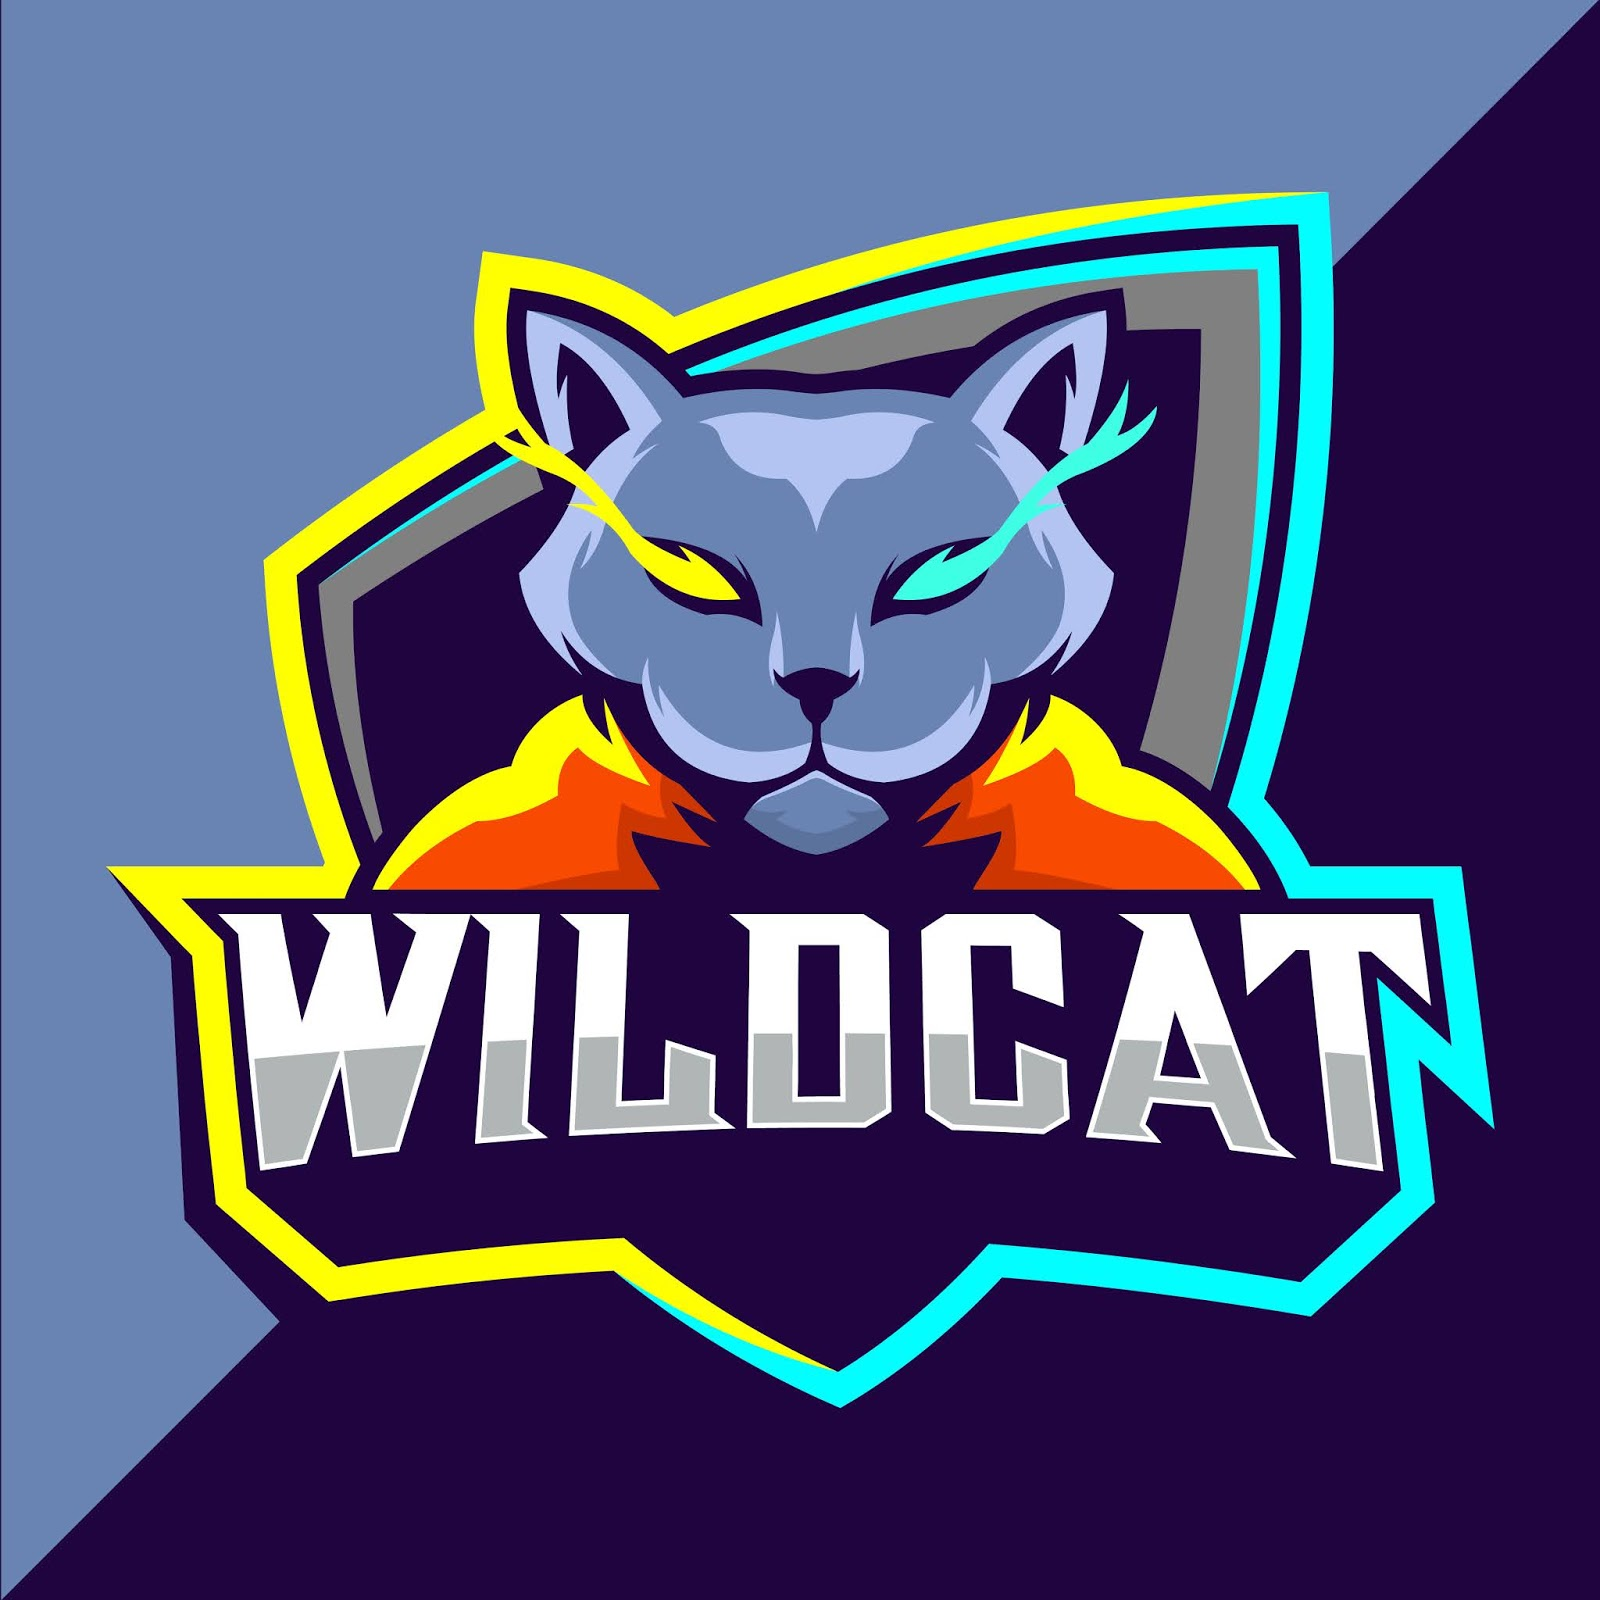 Wildcats Mascot Esport Logo Design Free Download Vector CDR, AI, EPS and PNG Formats